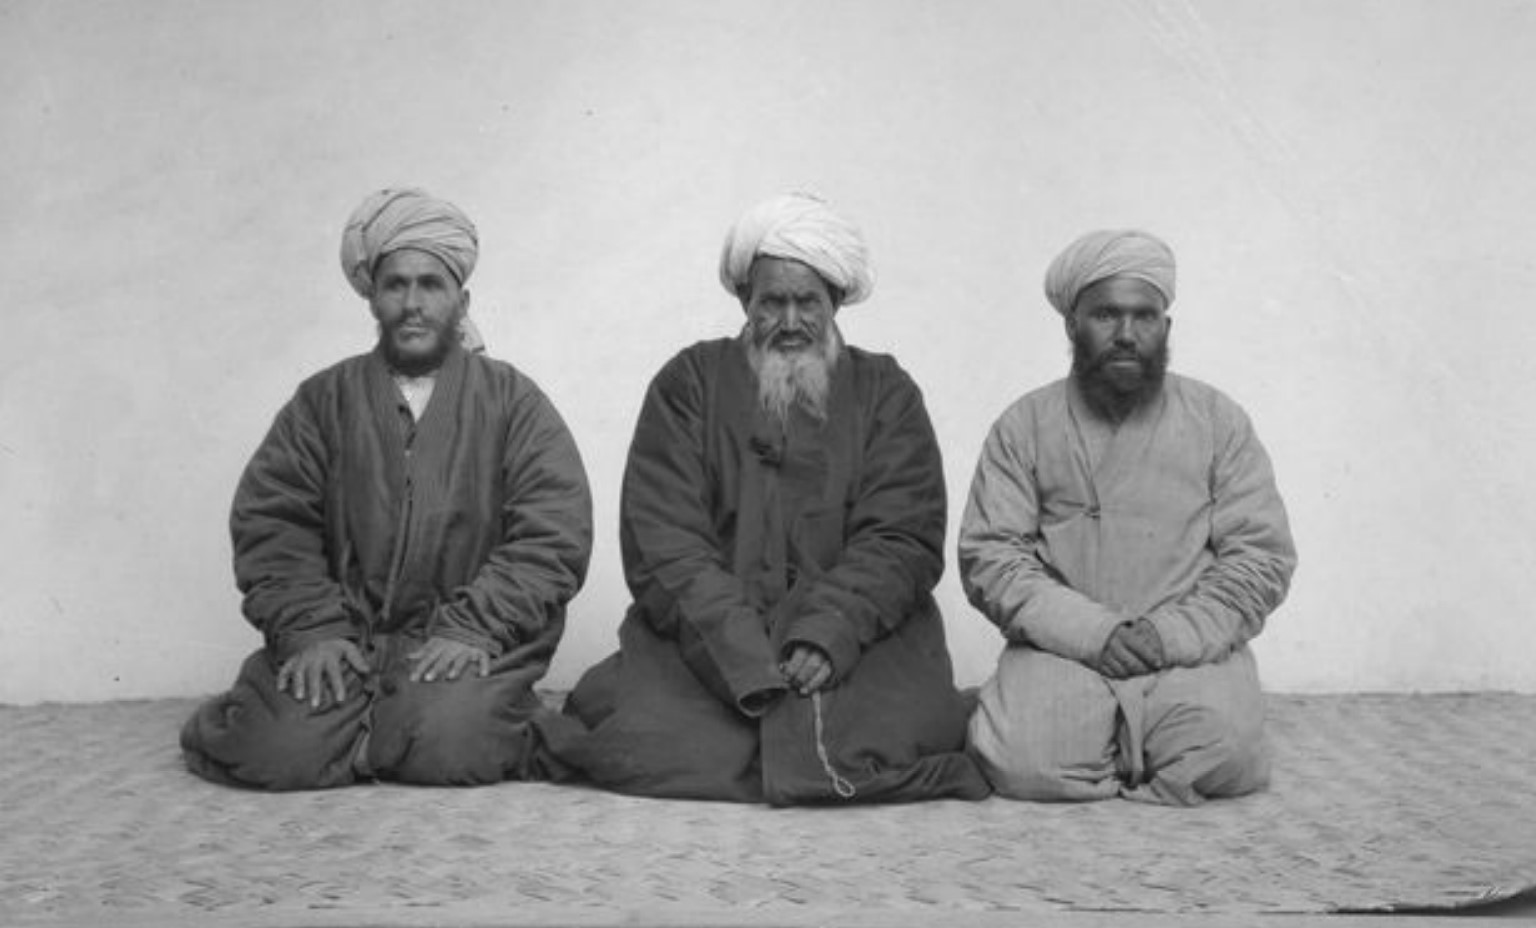 Абдул Карим Ахундзаде, Абдулла-джан (индийский аксакал) и Махмуд-джан (Афганский лавочник)